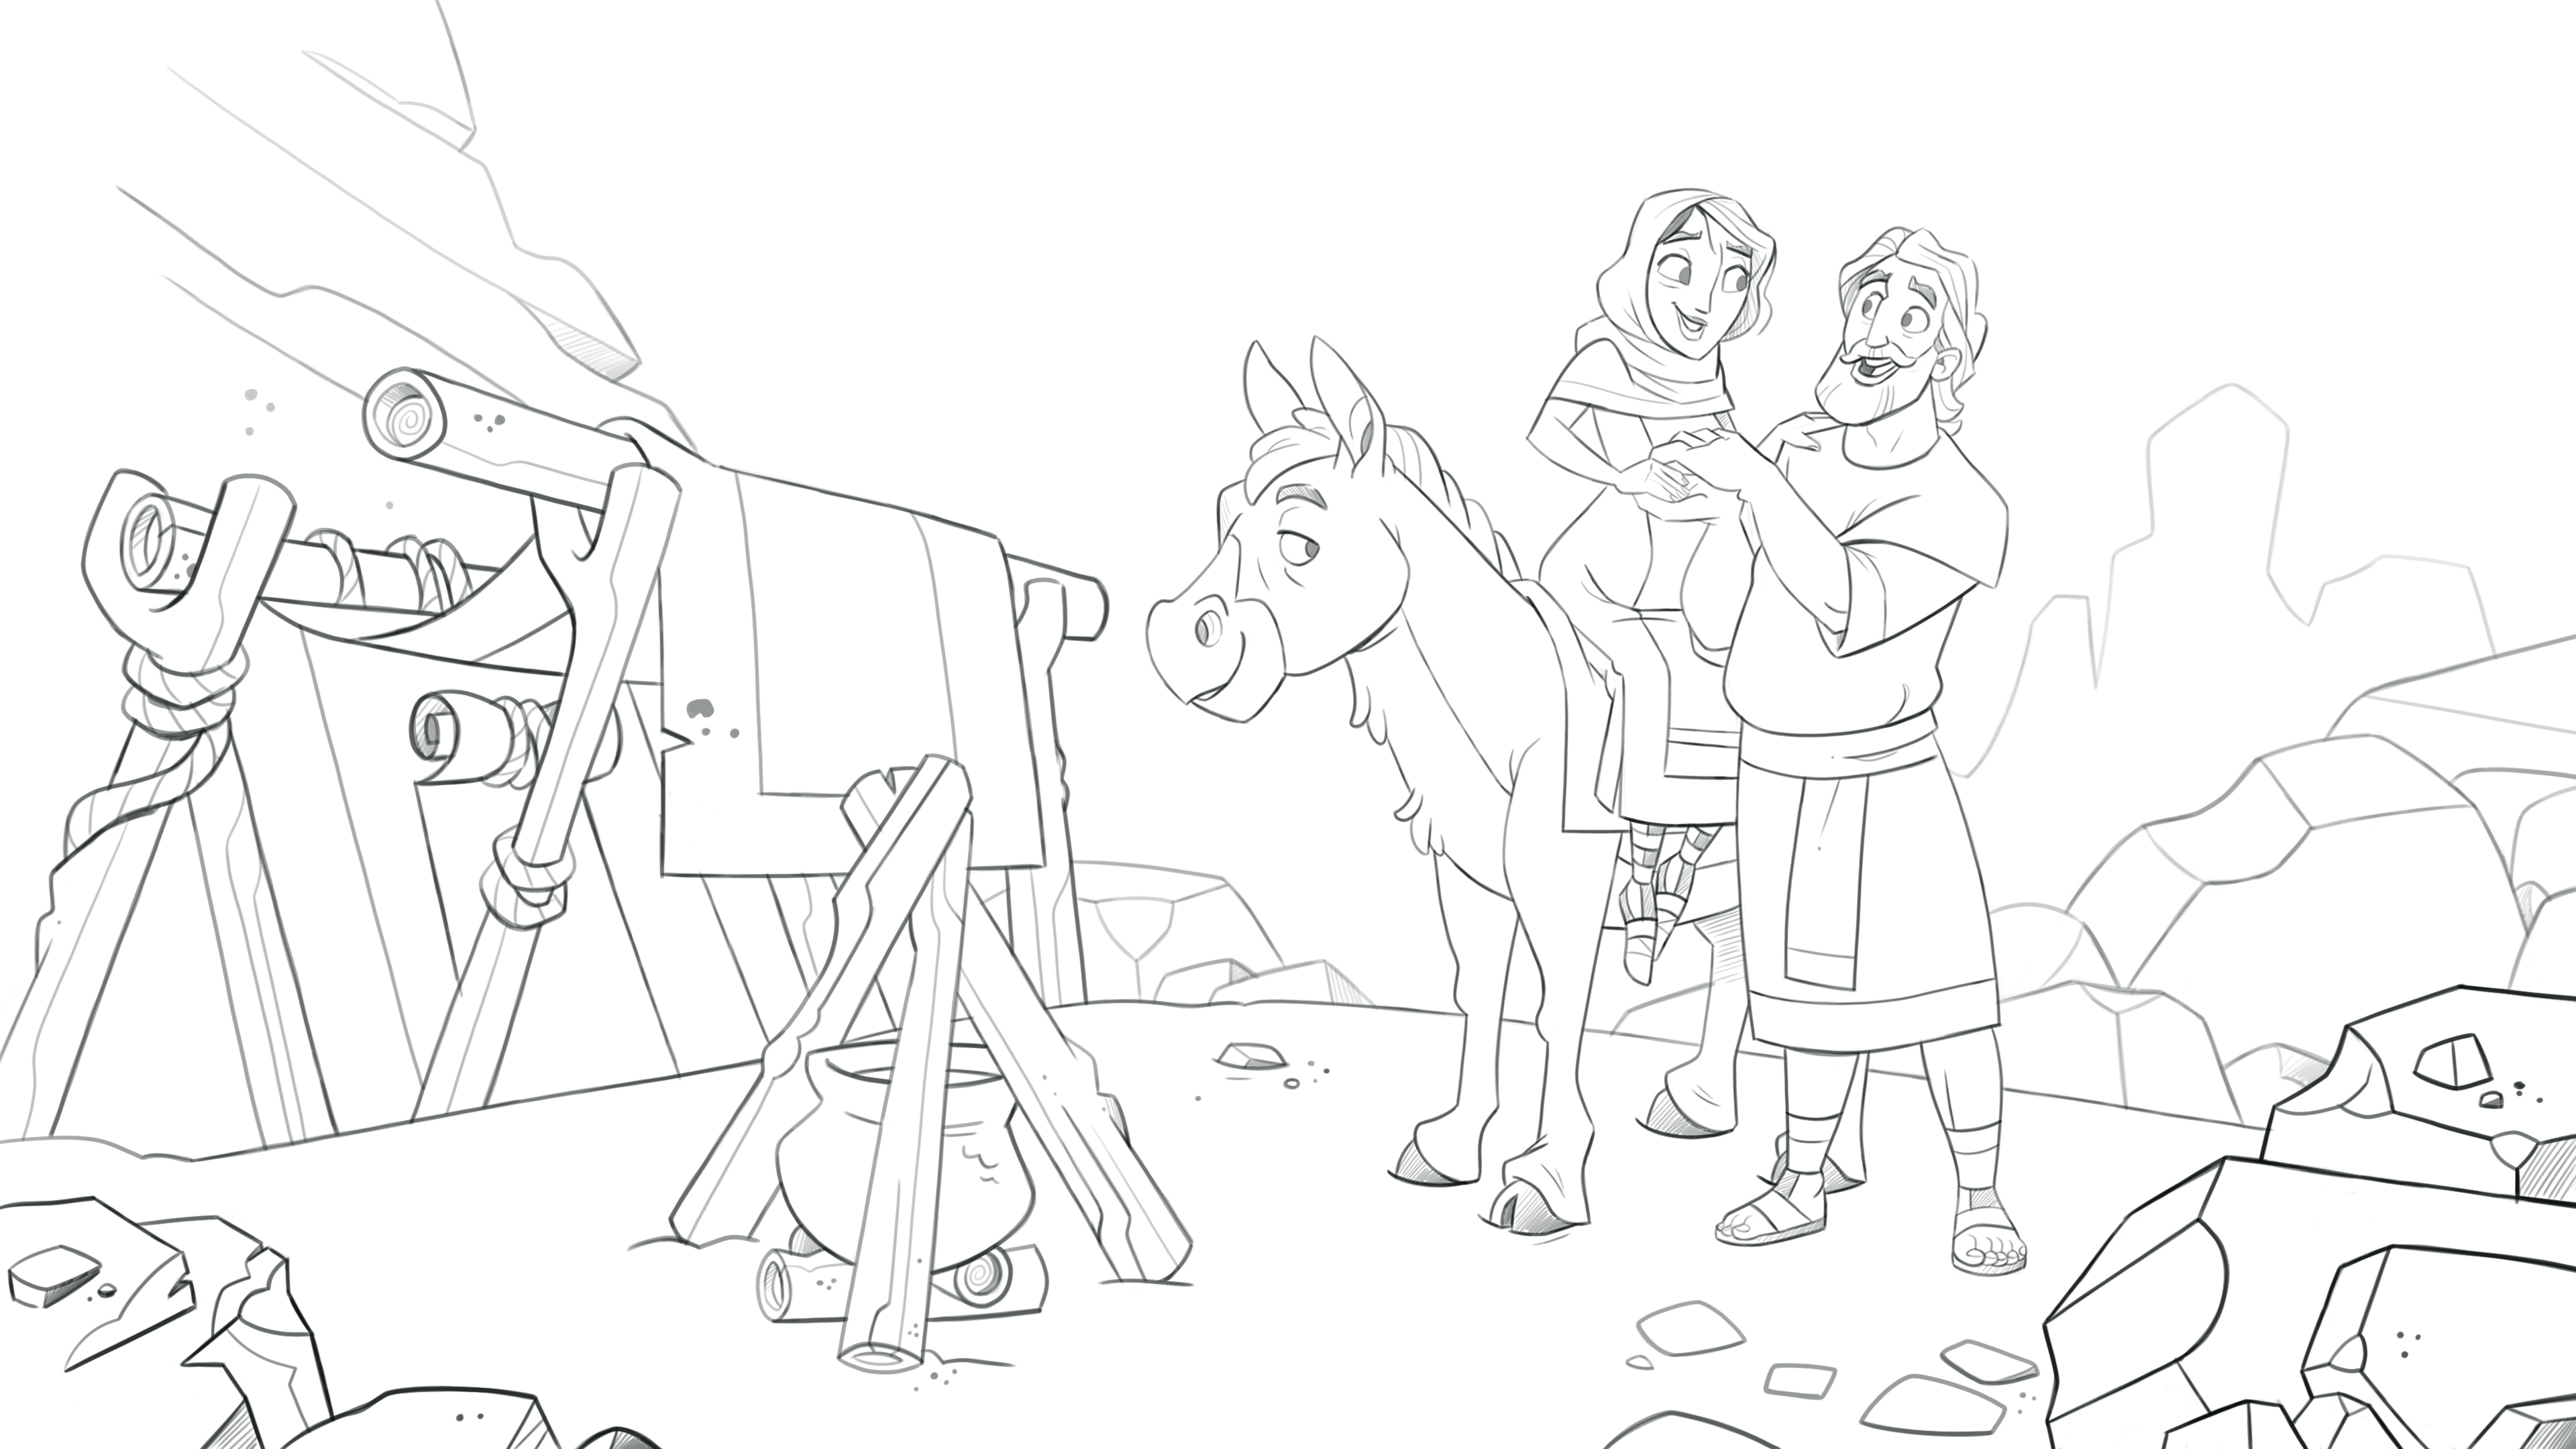 Scene_Mary_Joseph_Sketch_01